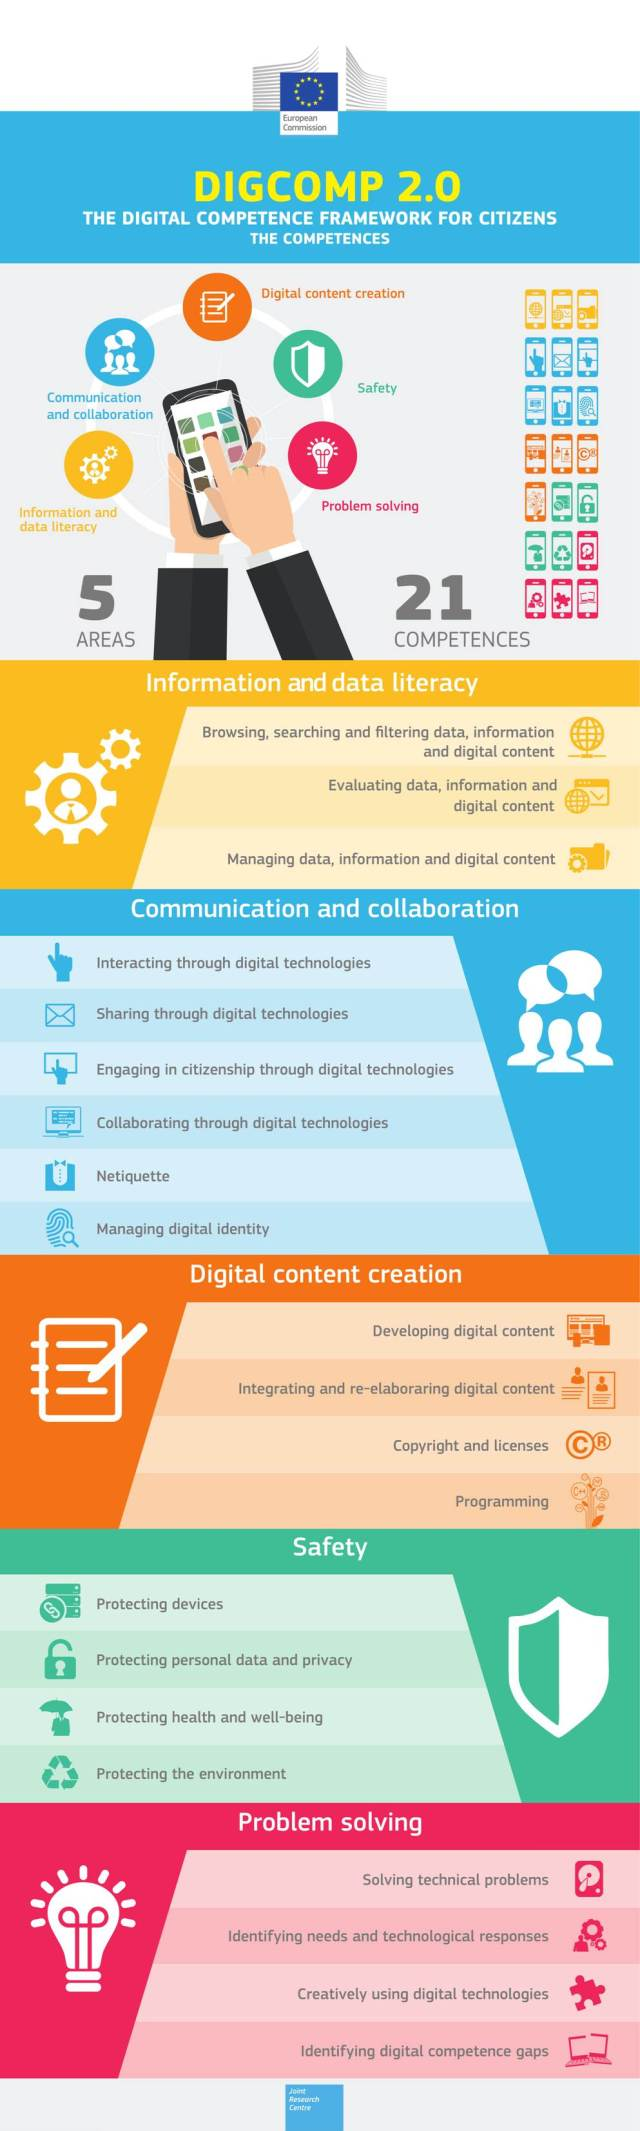 Infografía DigComp 2.0